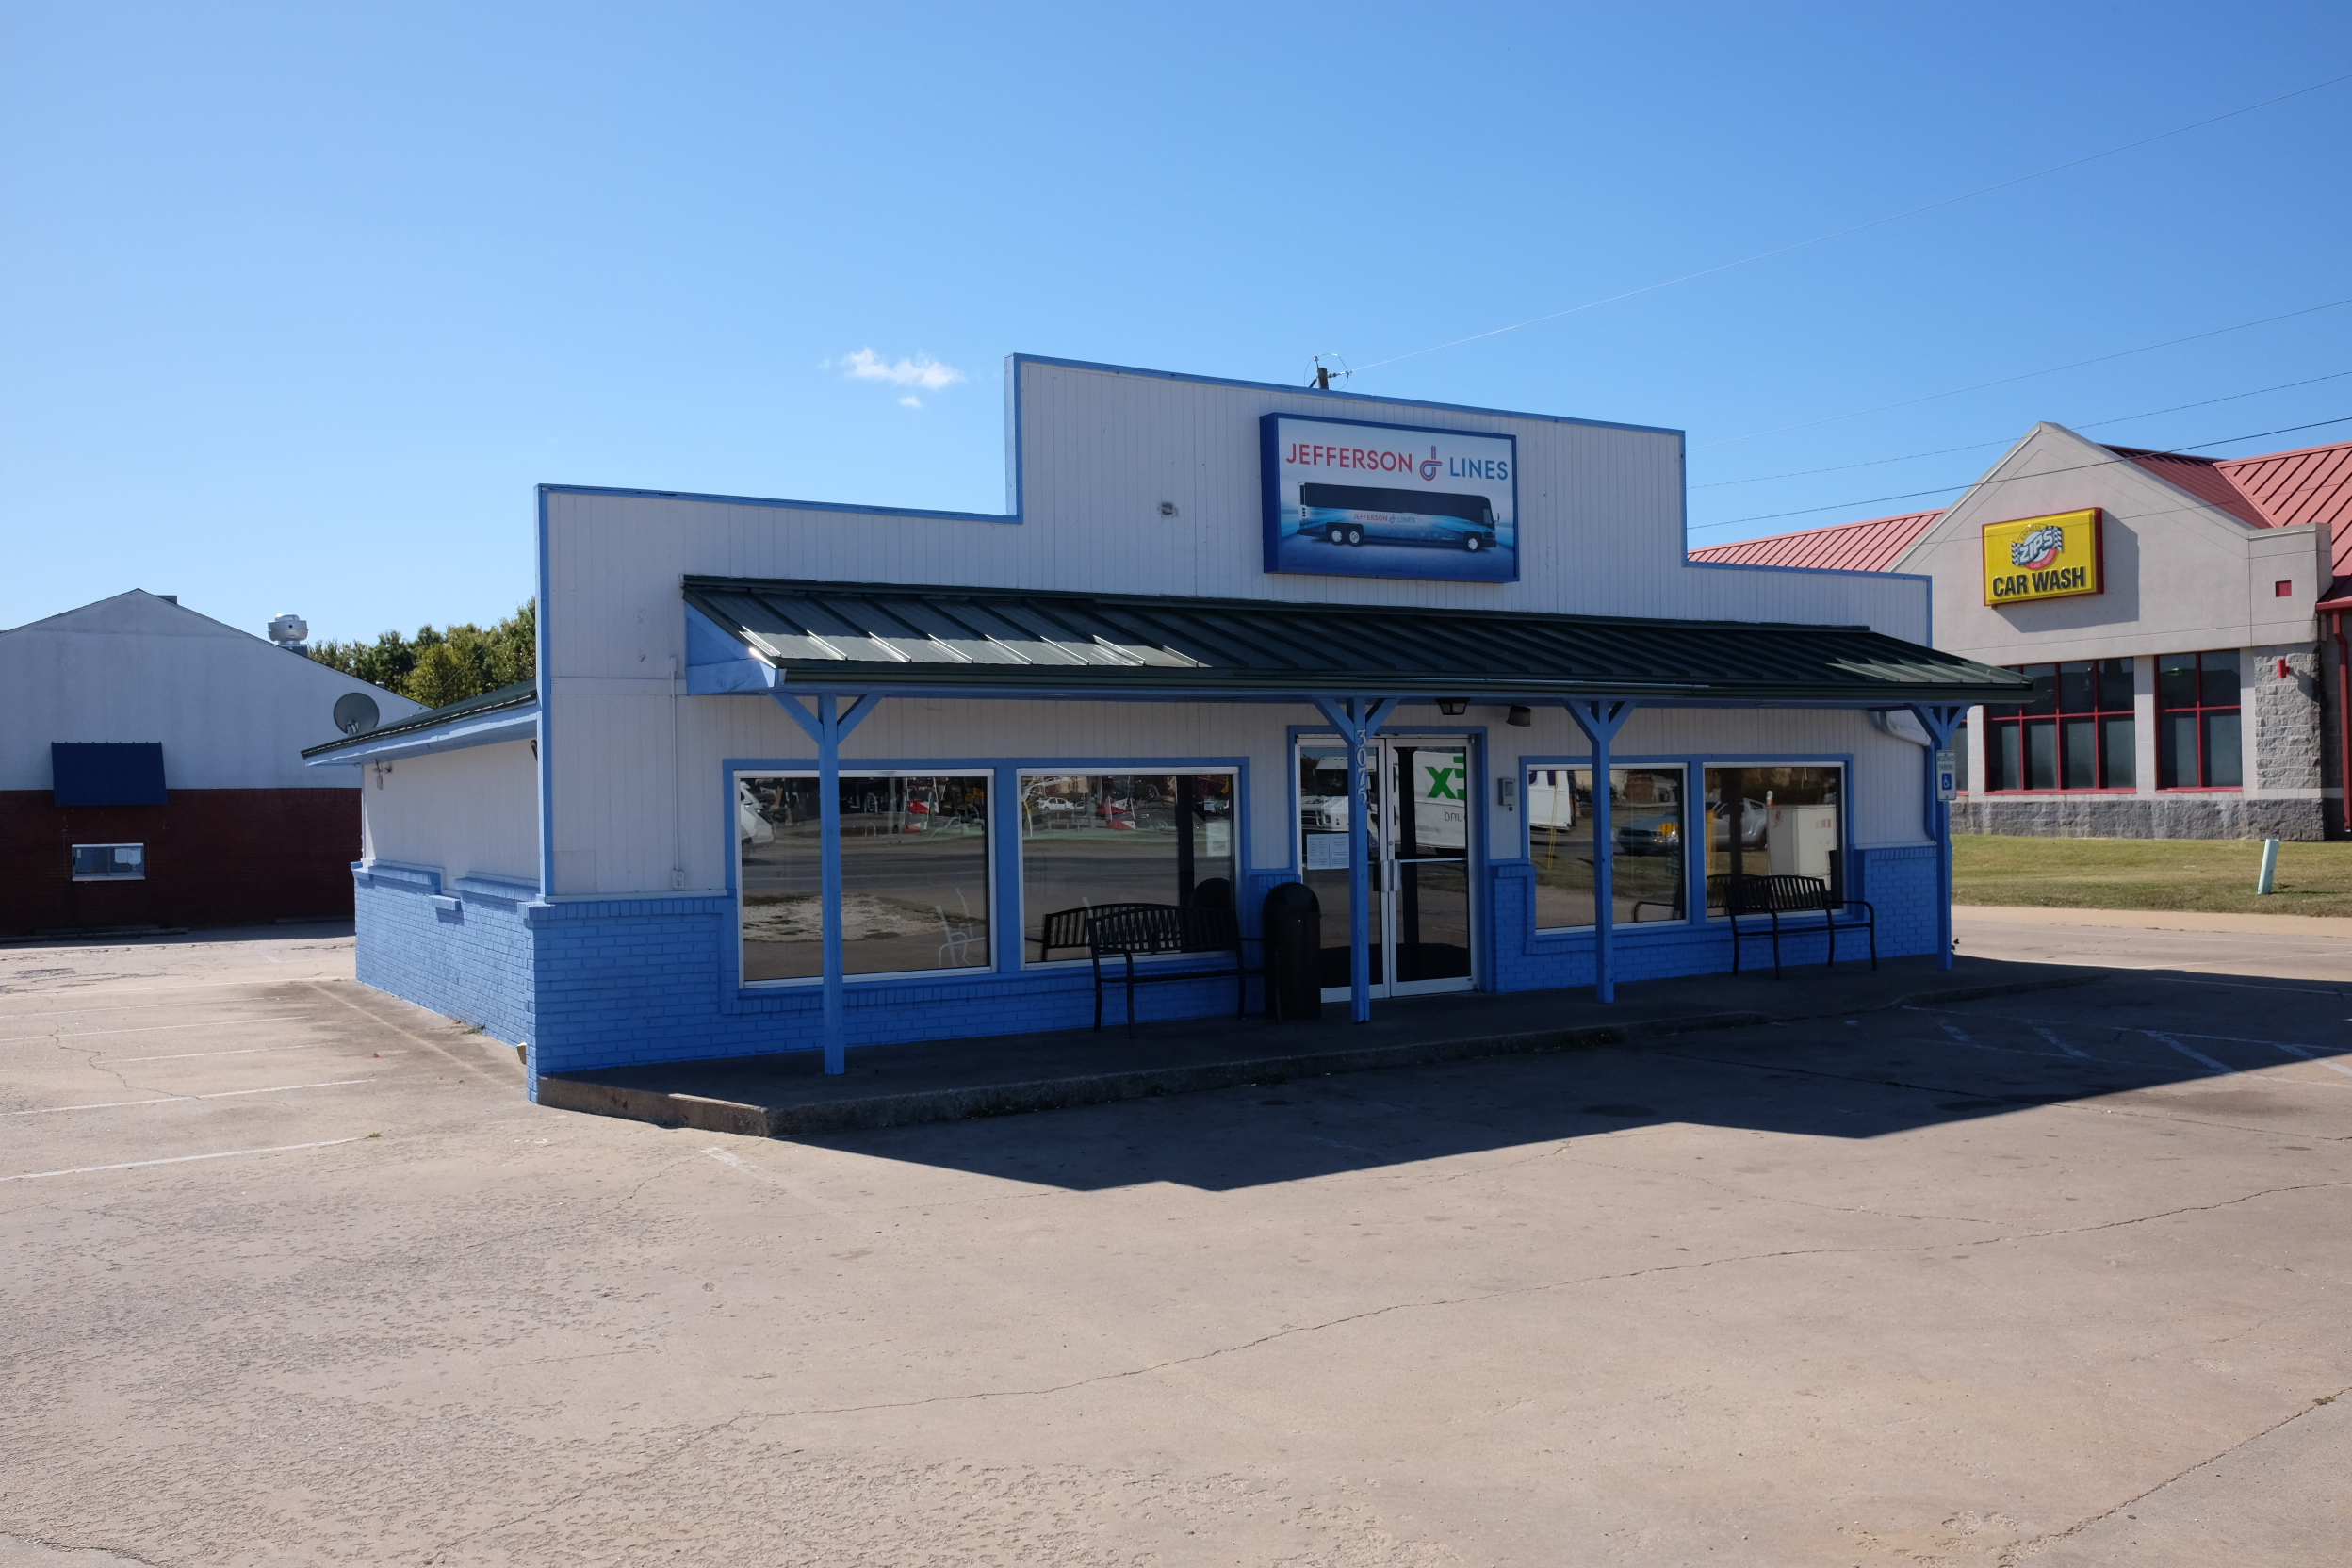 Fayetteville bus station